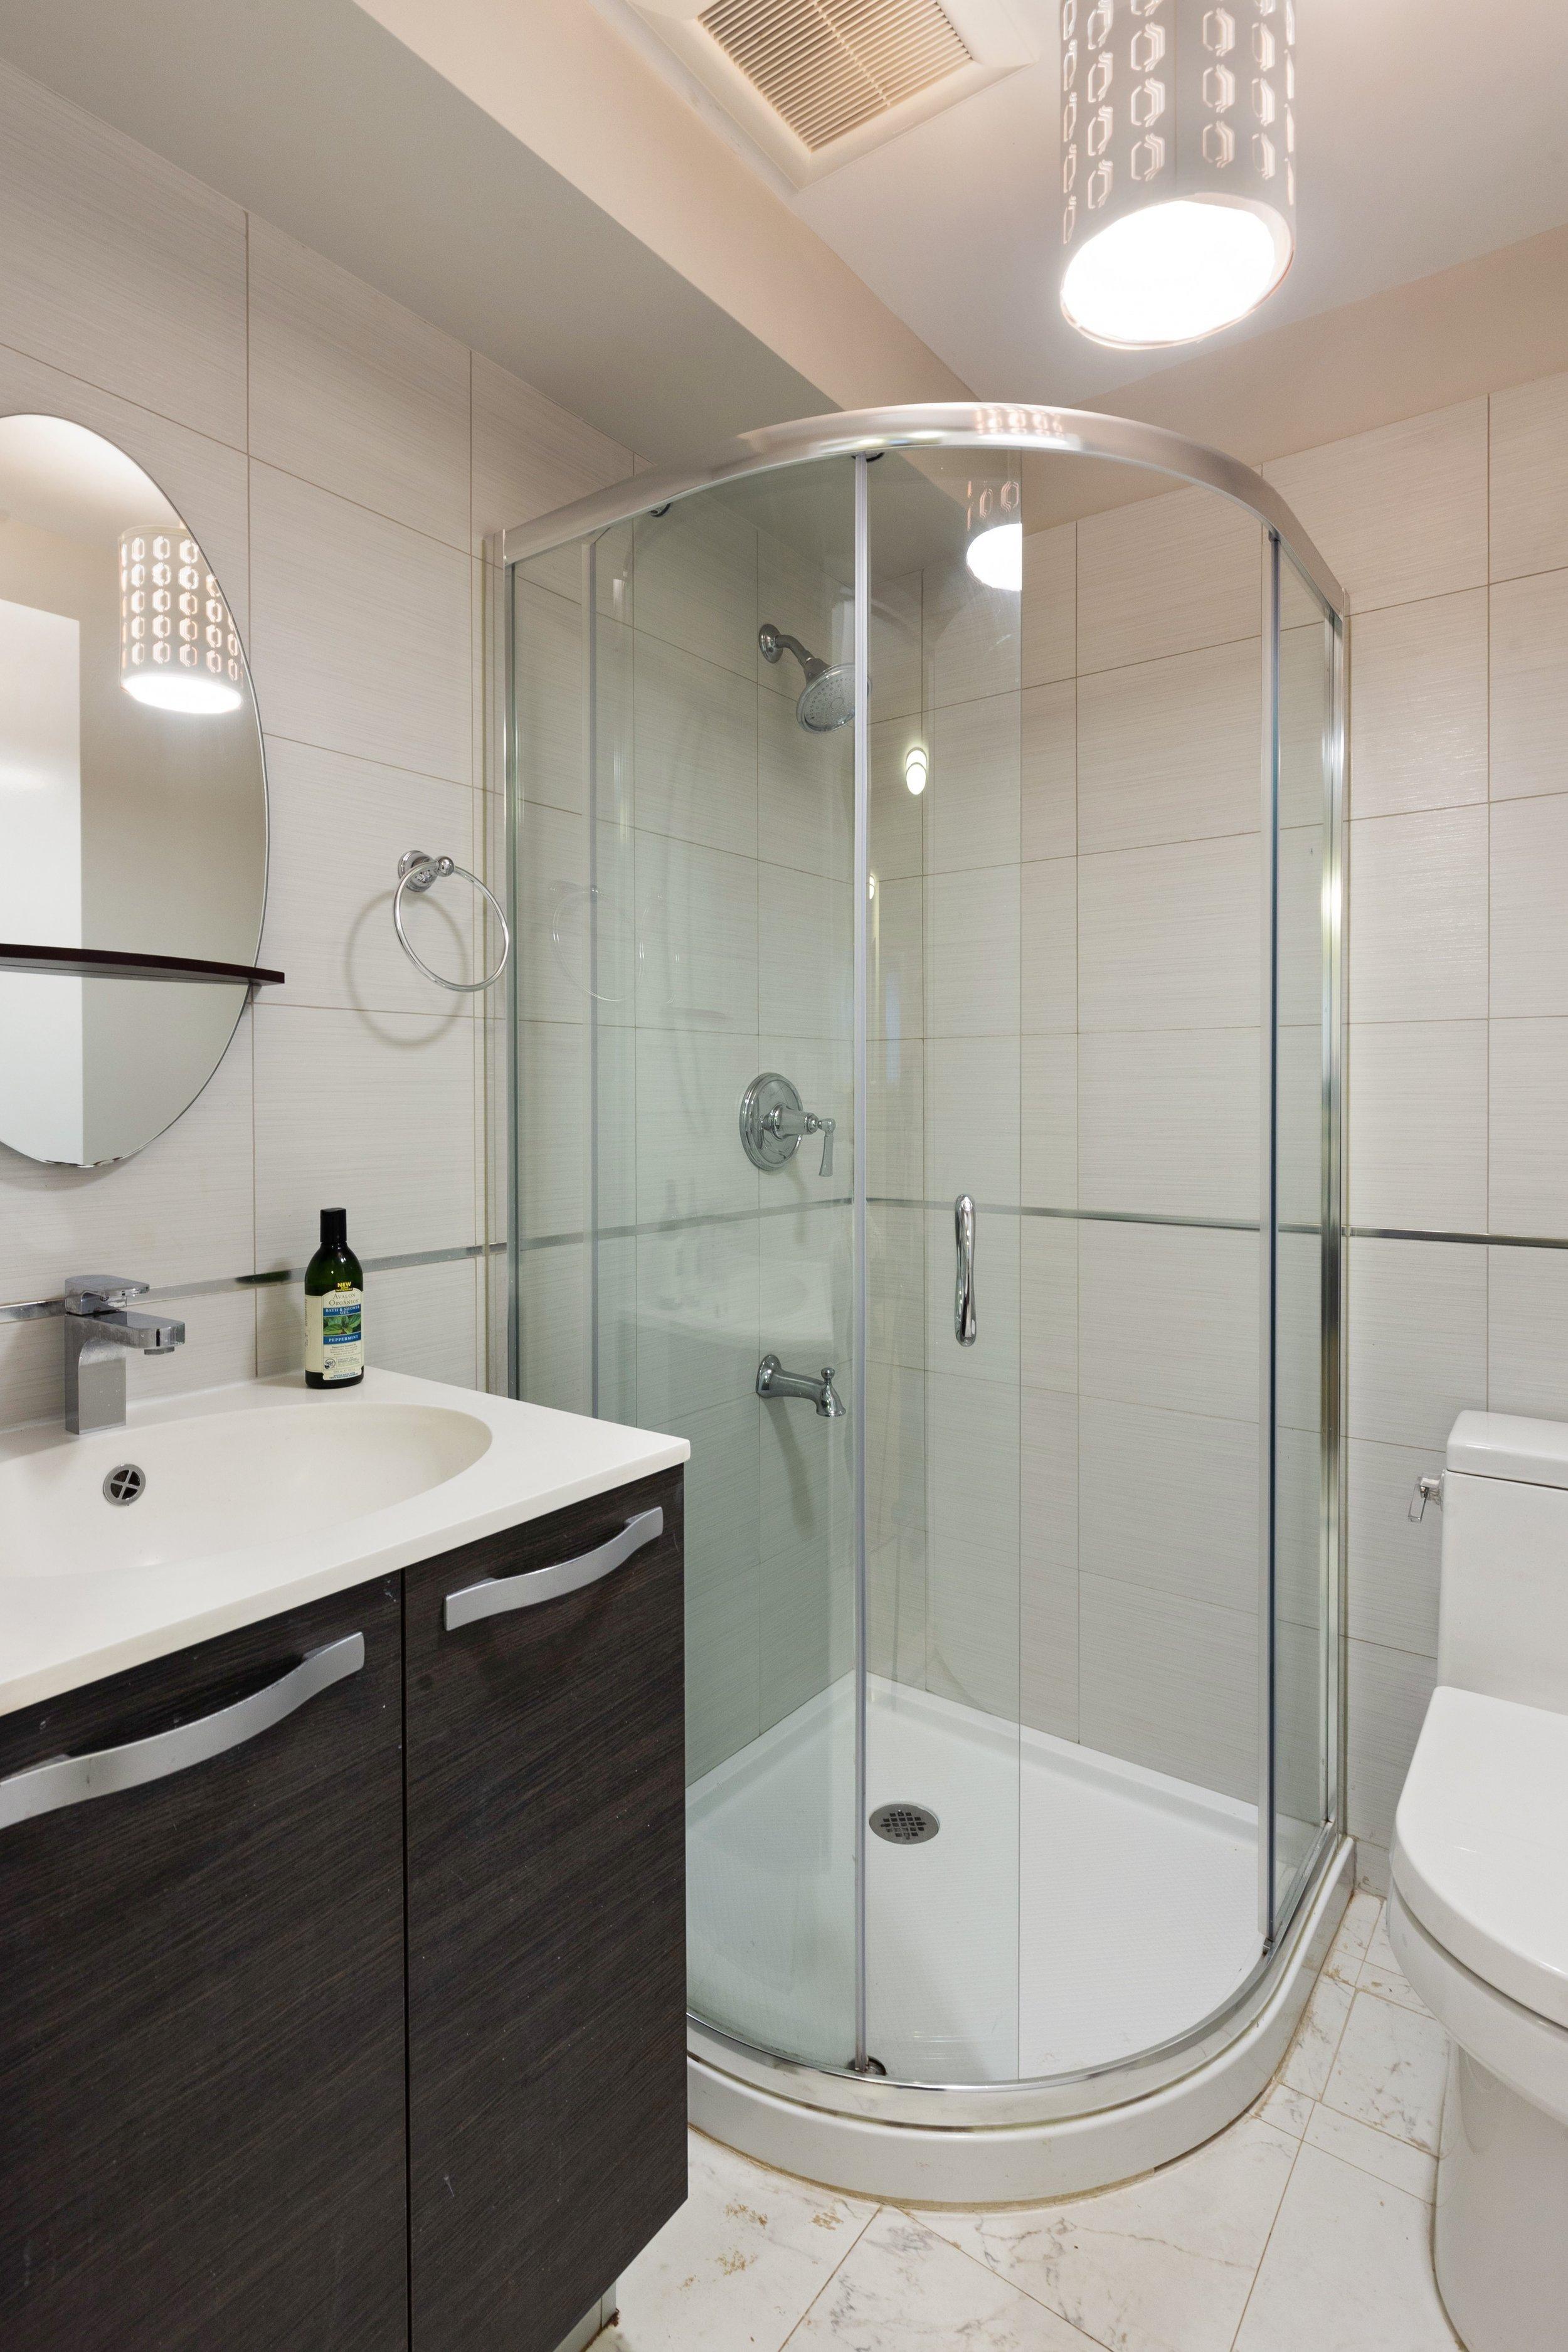 10_16388thAvenue_1A_323_Bathroom_HiRes.jpg